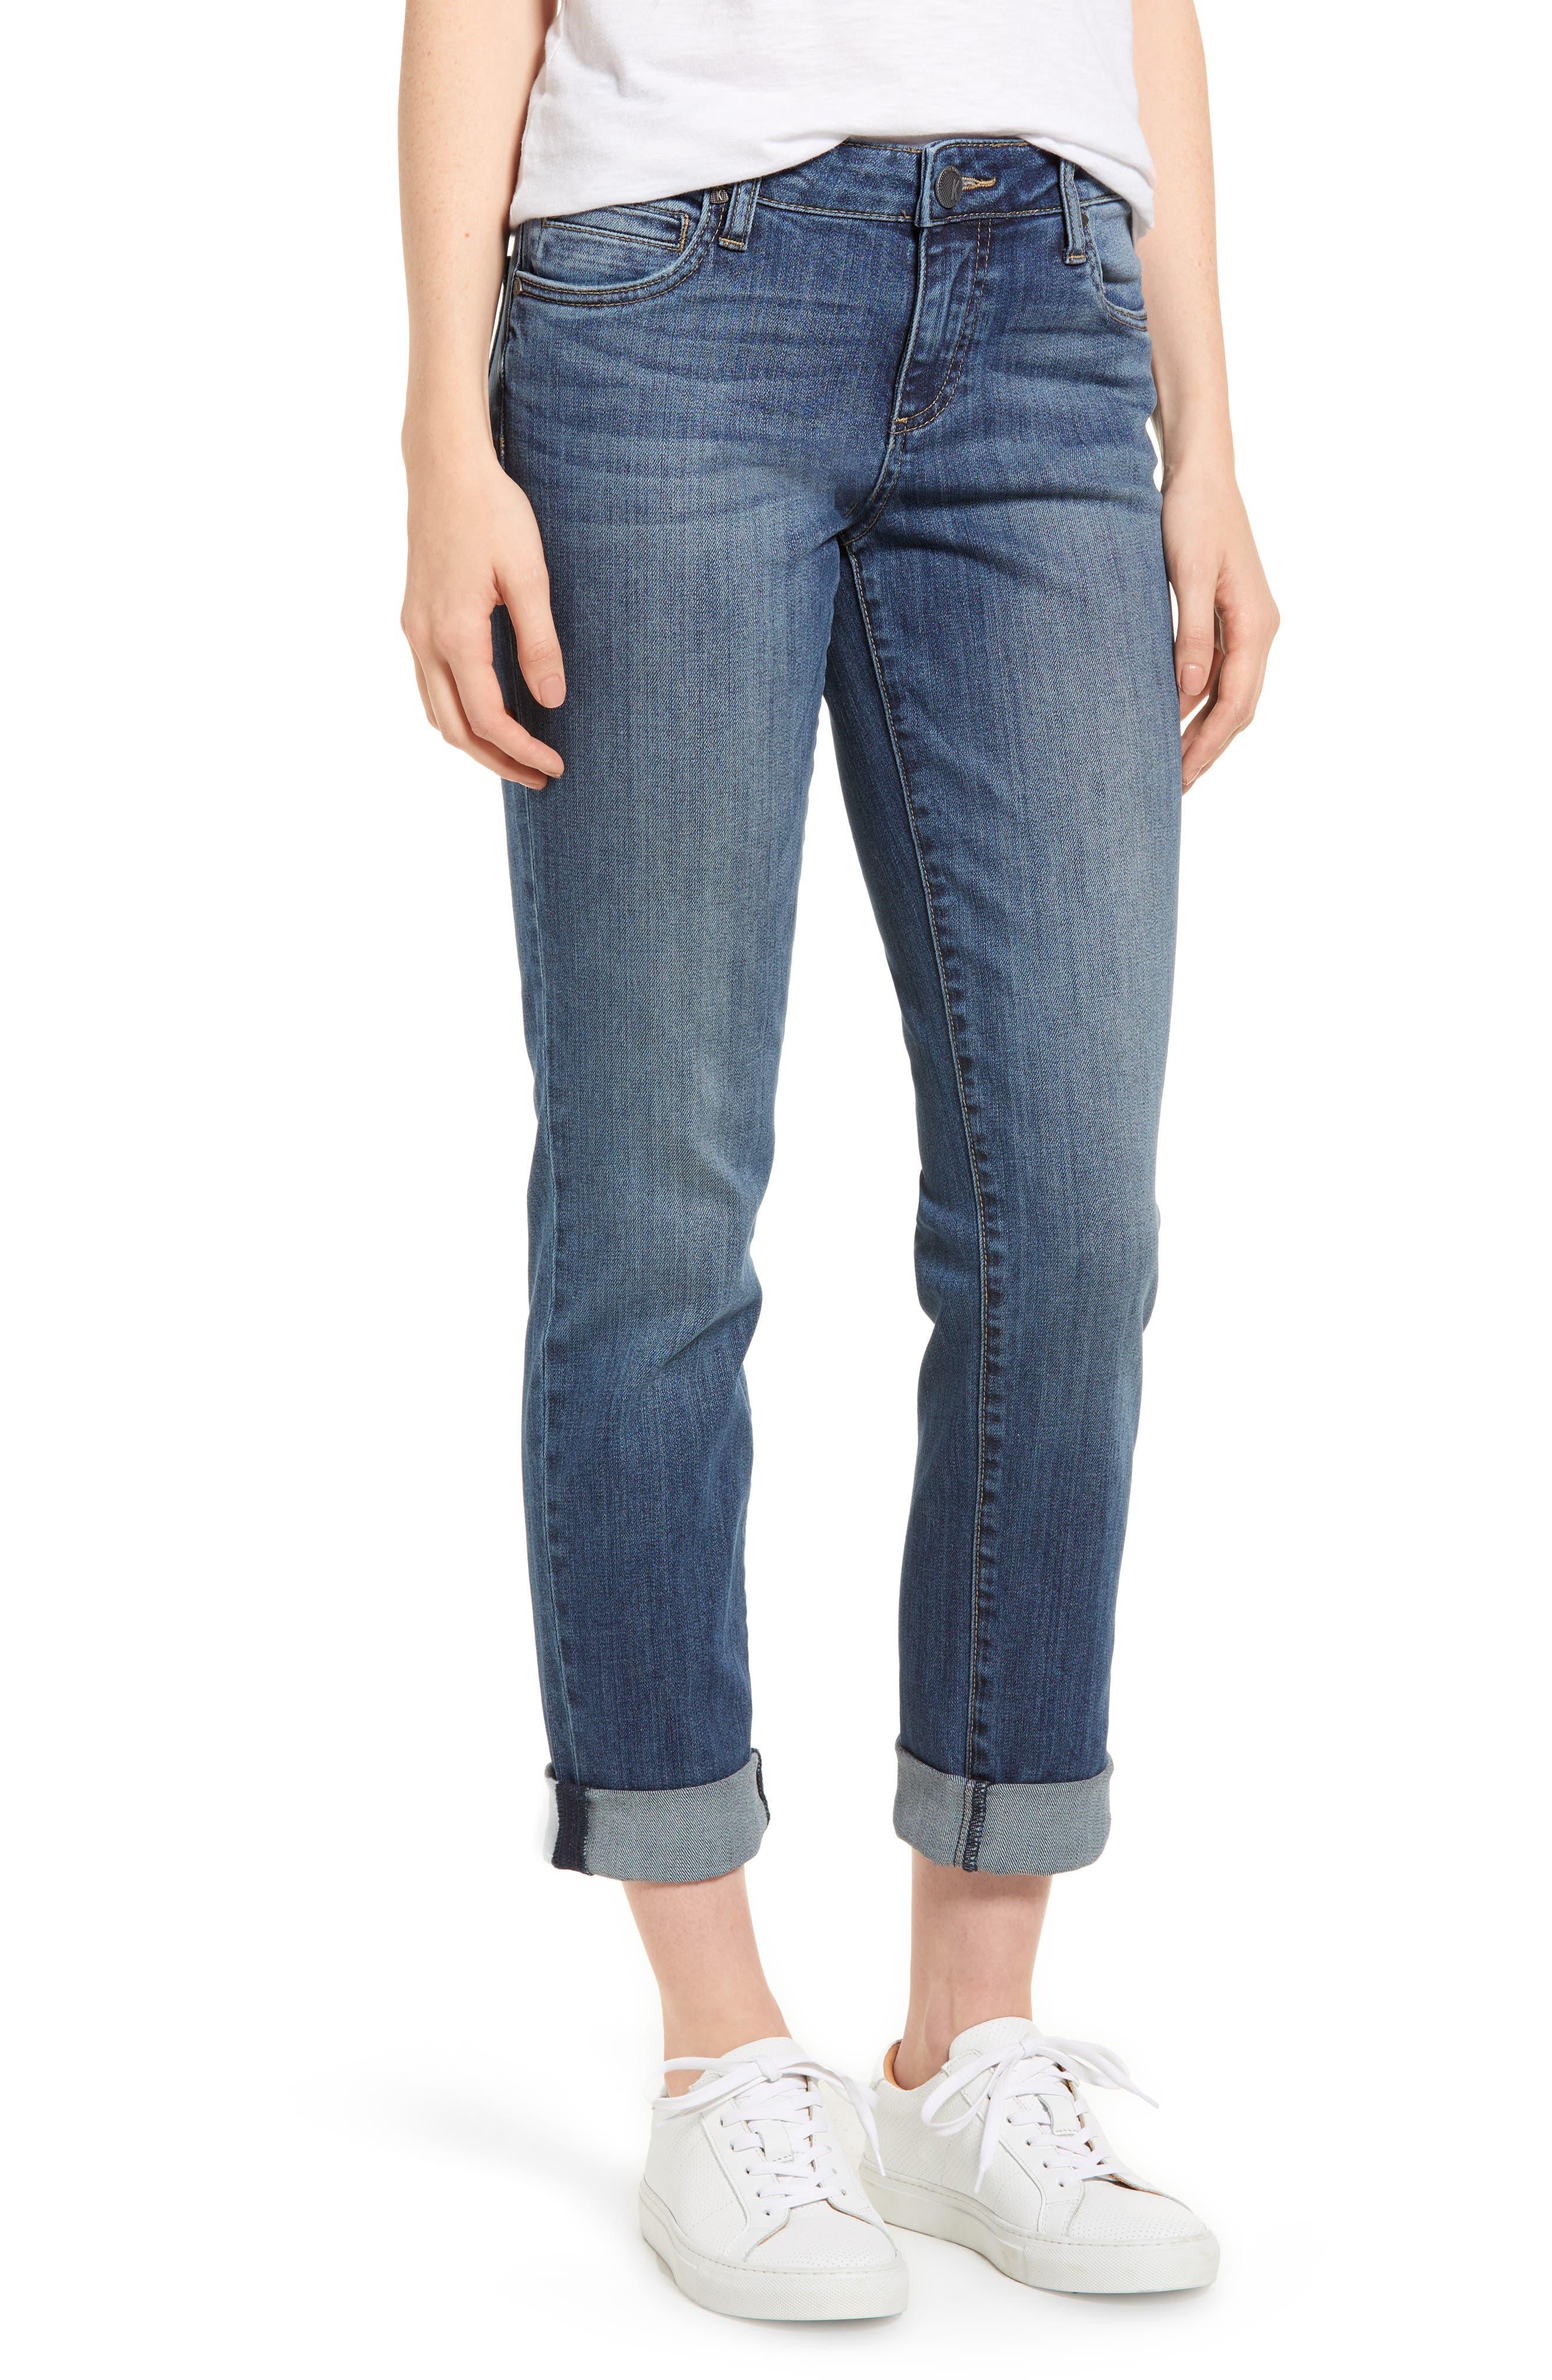 Catherine Boyfriend Jeans,                         Main,                         color, 415